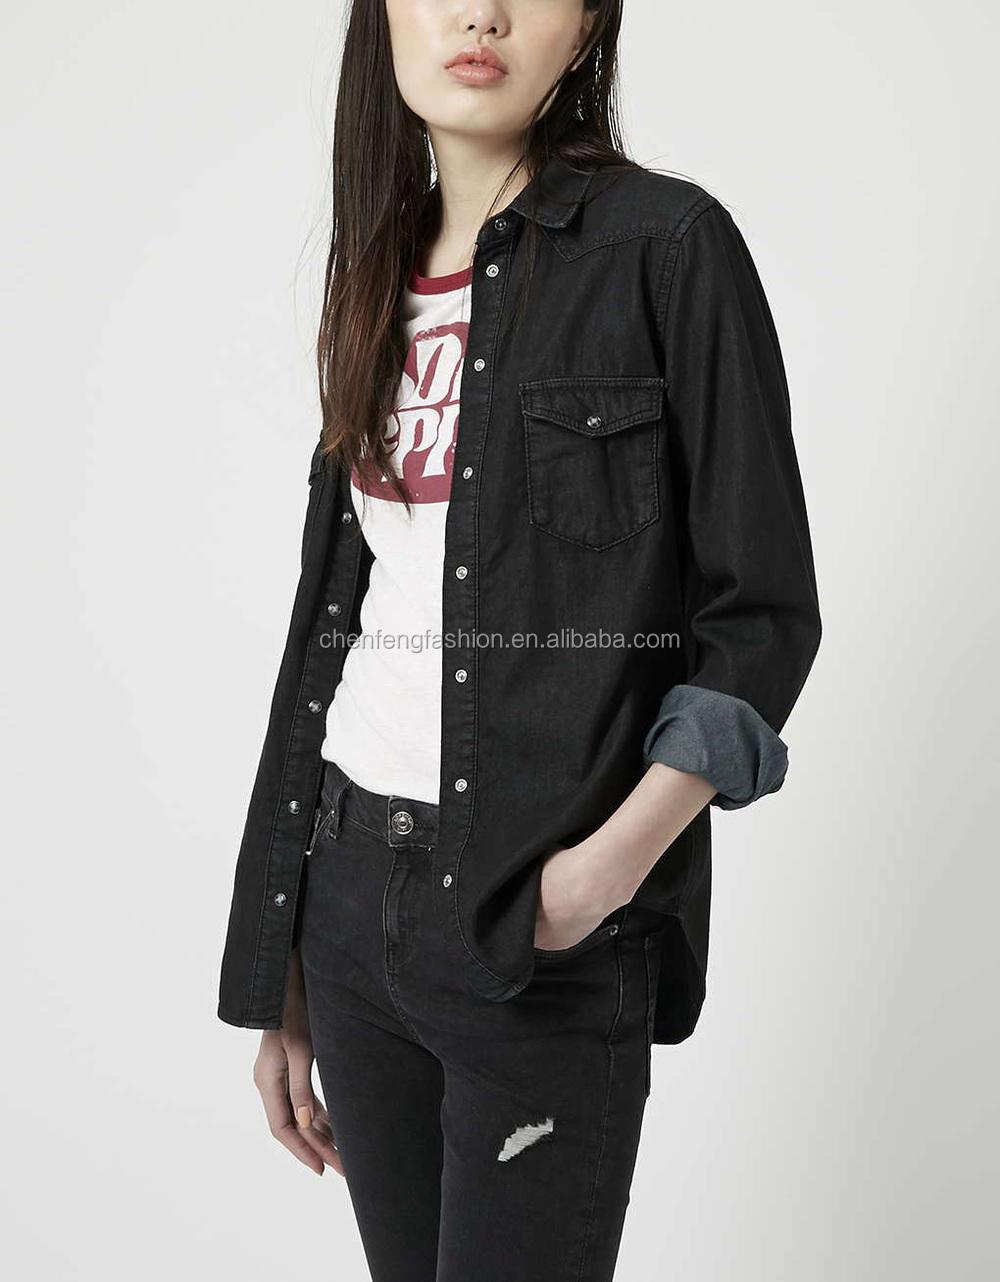 Womens Black Cotton Denim Fitted Western Shirt - Buy Black Denim ...